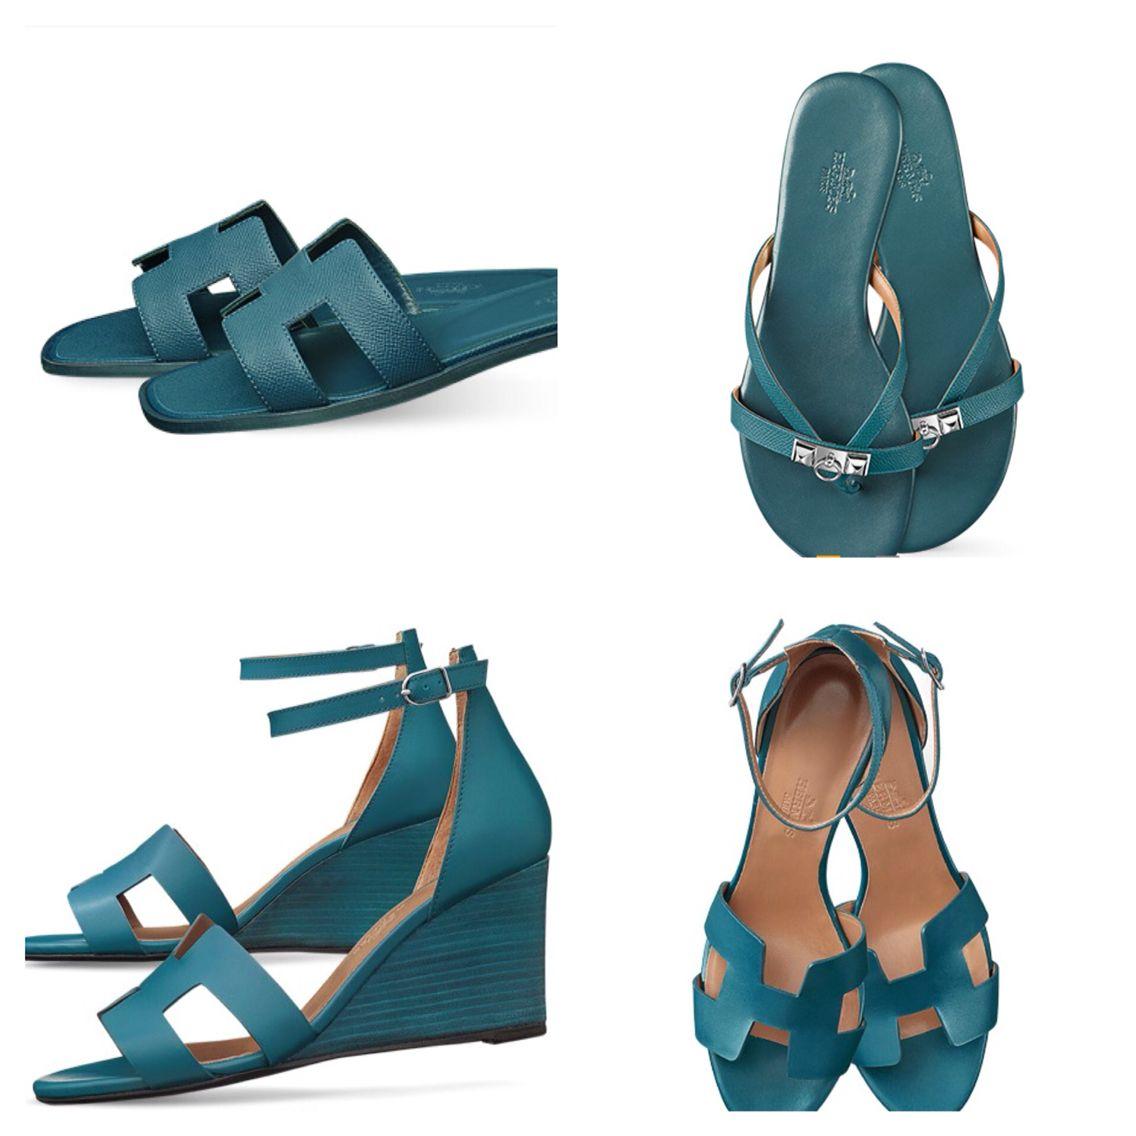 94d9078555c4 Hermes in beautiful blue Oran sandal Corfou sandal Legend wedge 💕💖